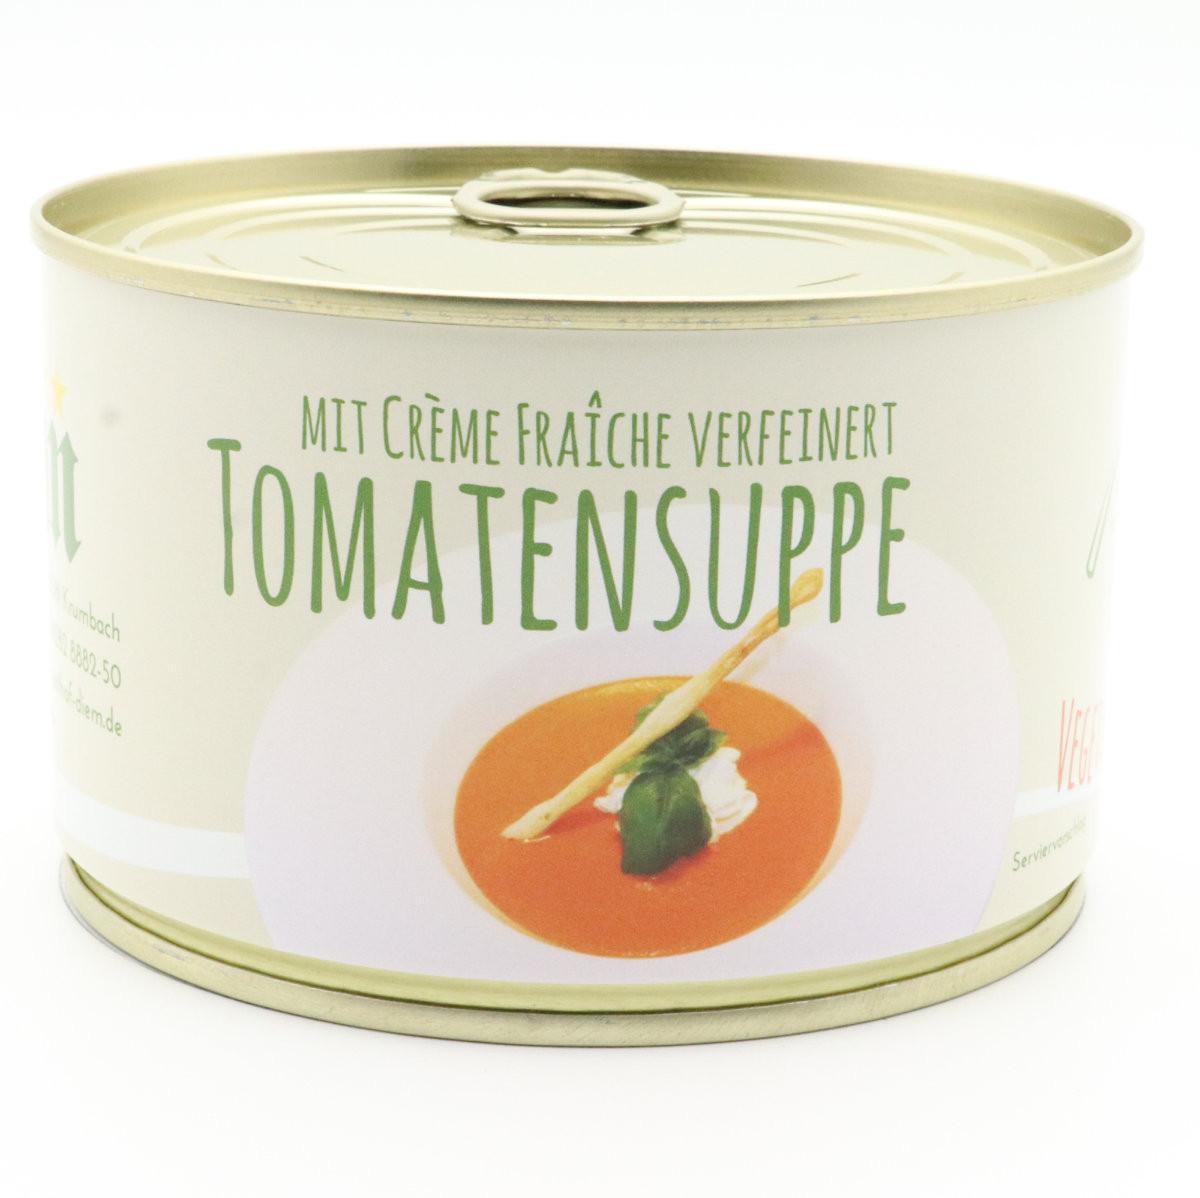 Tomatensuppe mit Créme Frâiche verfeinert